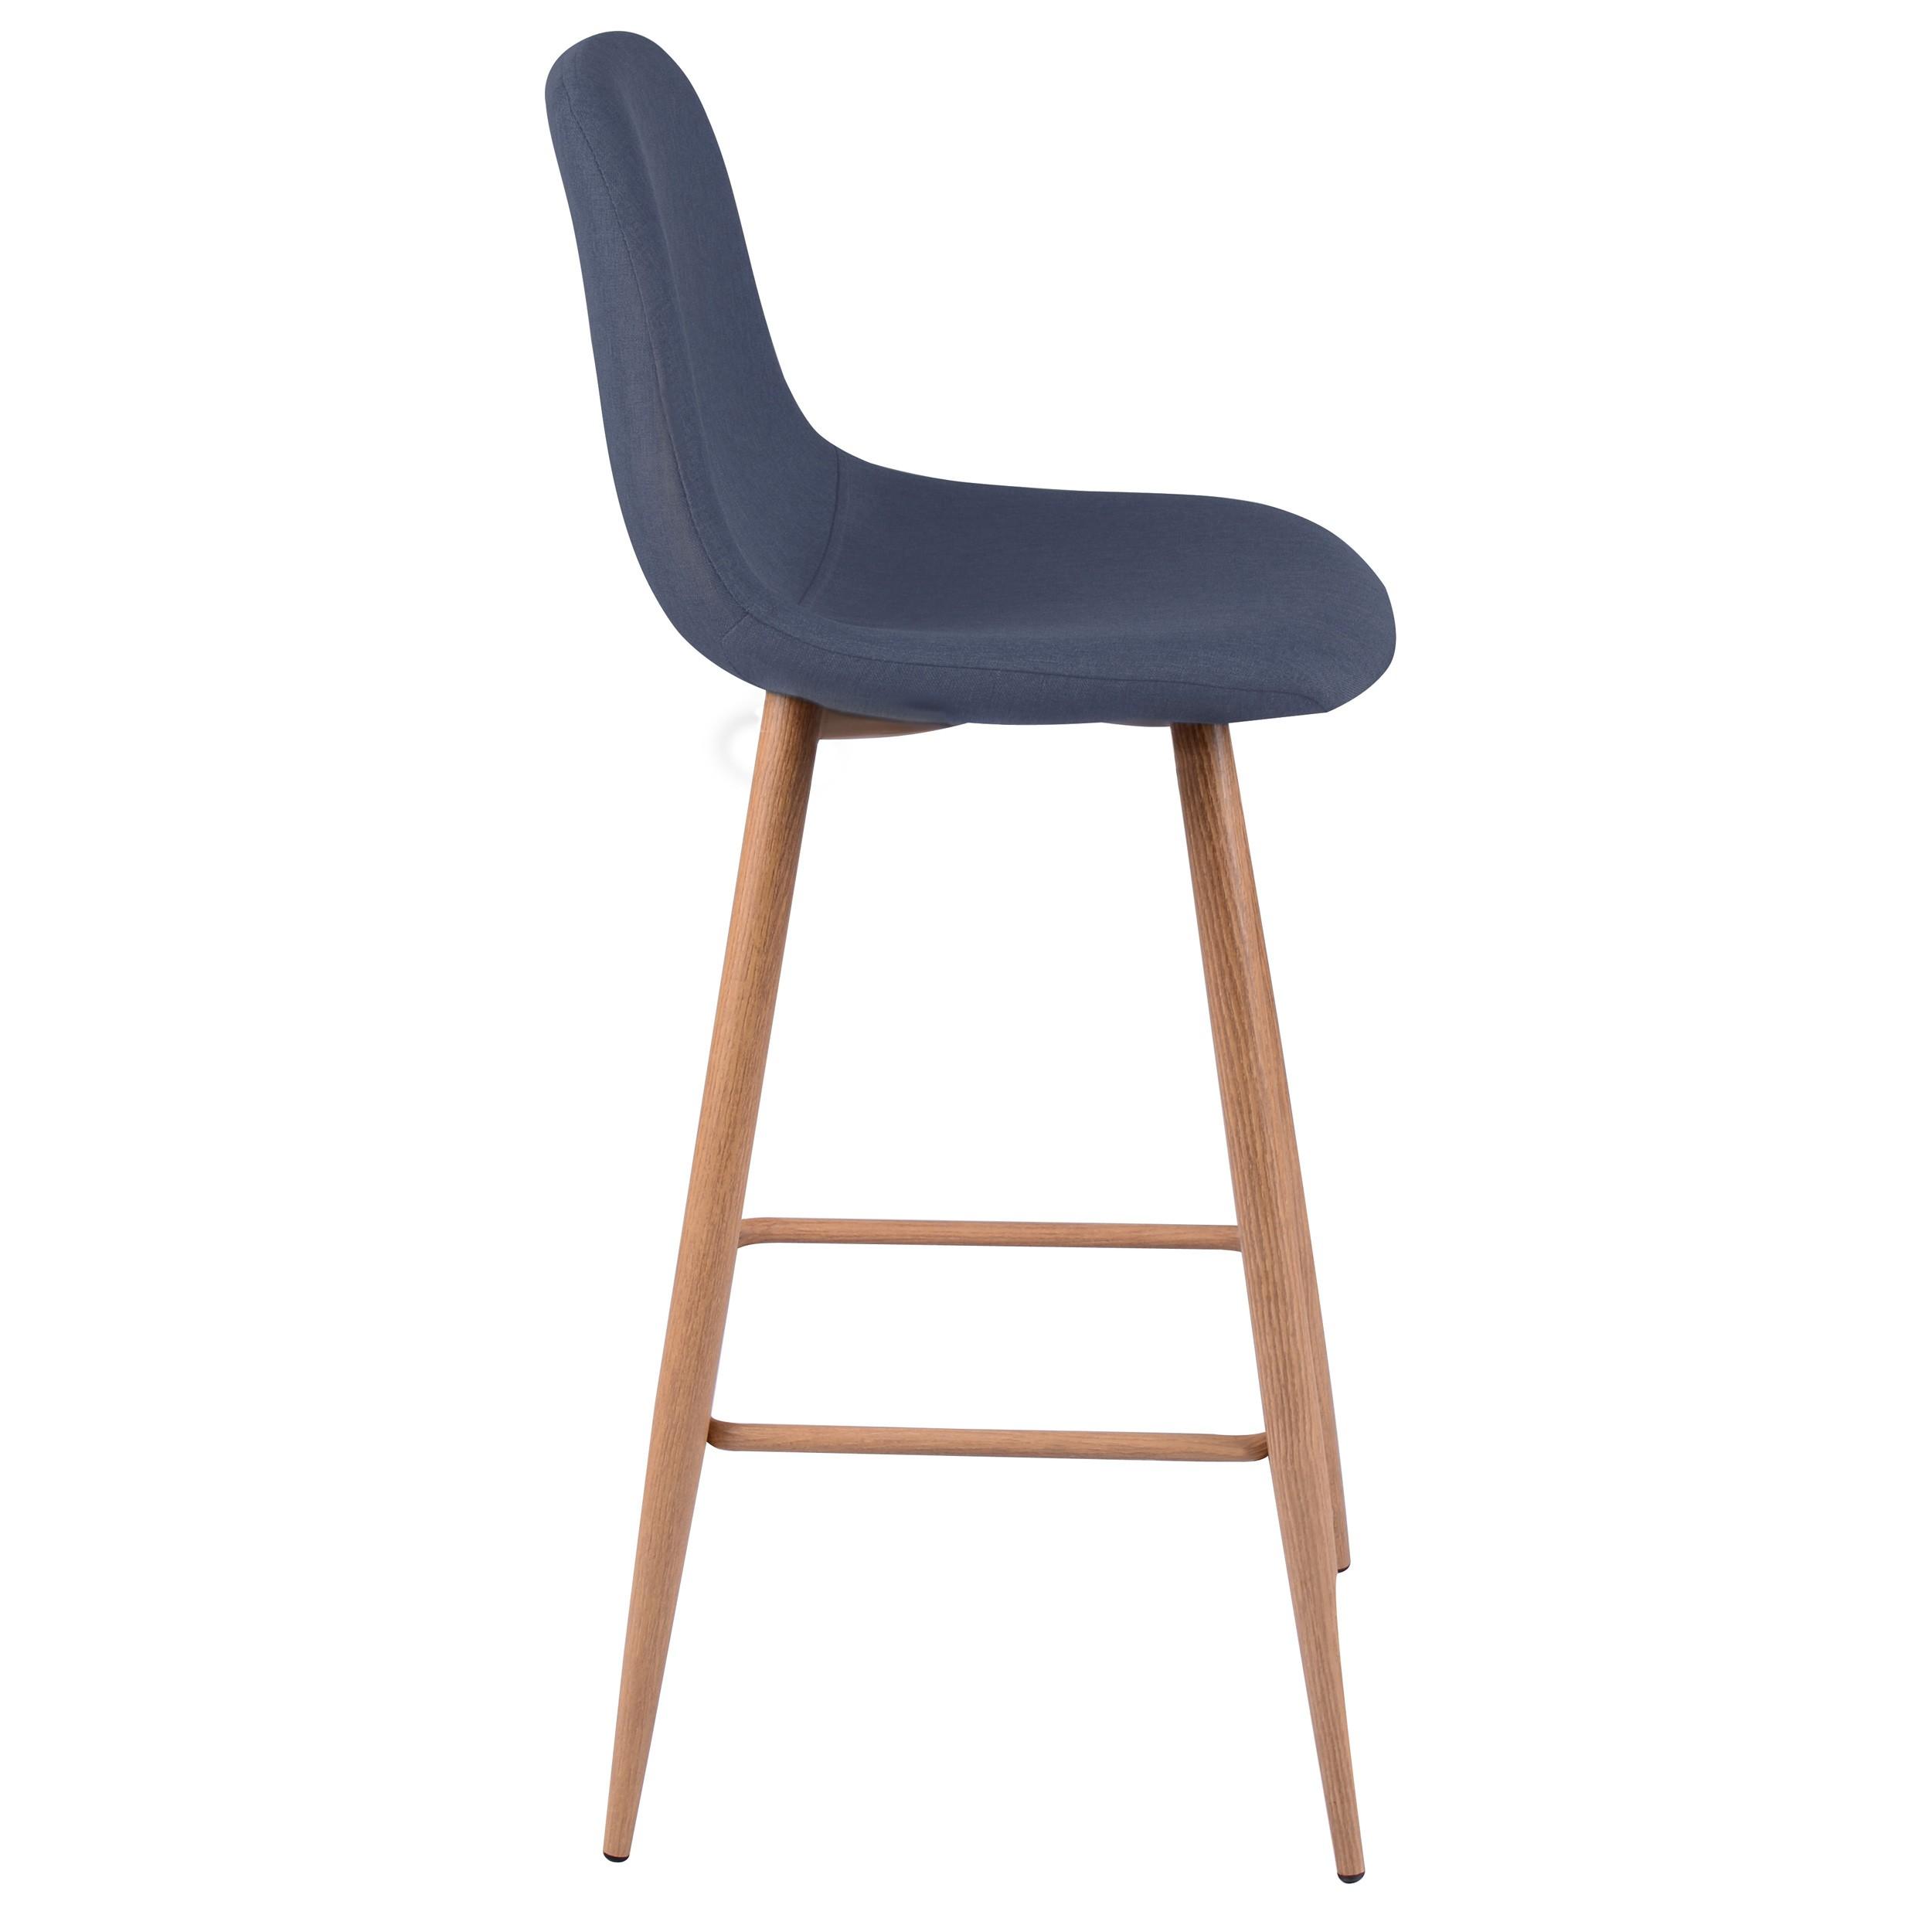 tabouret de bar fredrik bleu gris lot de 2 d couvrez nos tabourets de bar fredrik bleu gris. Black Bedroom Furniture Sets. Home Design Ideas